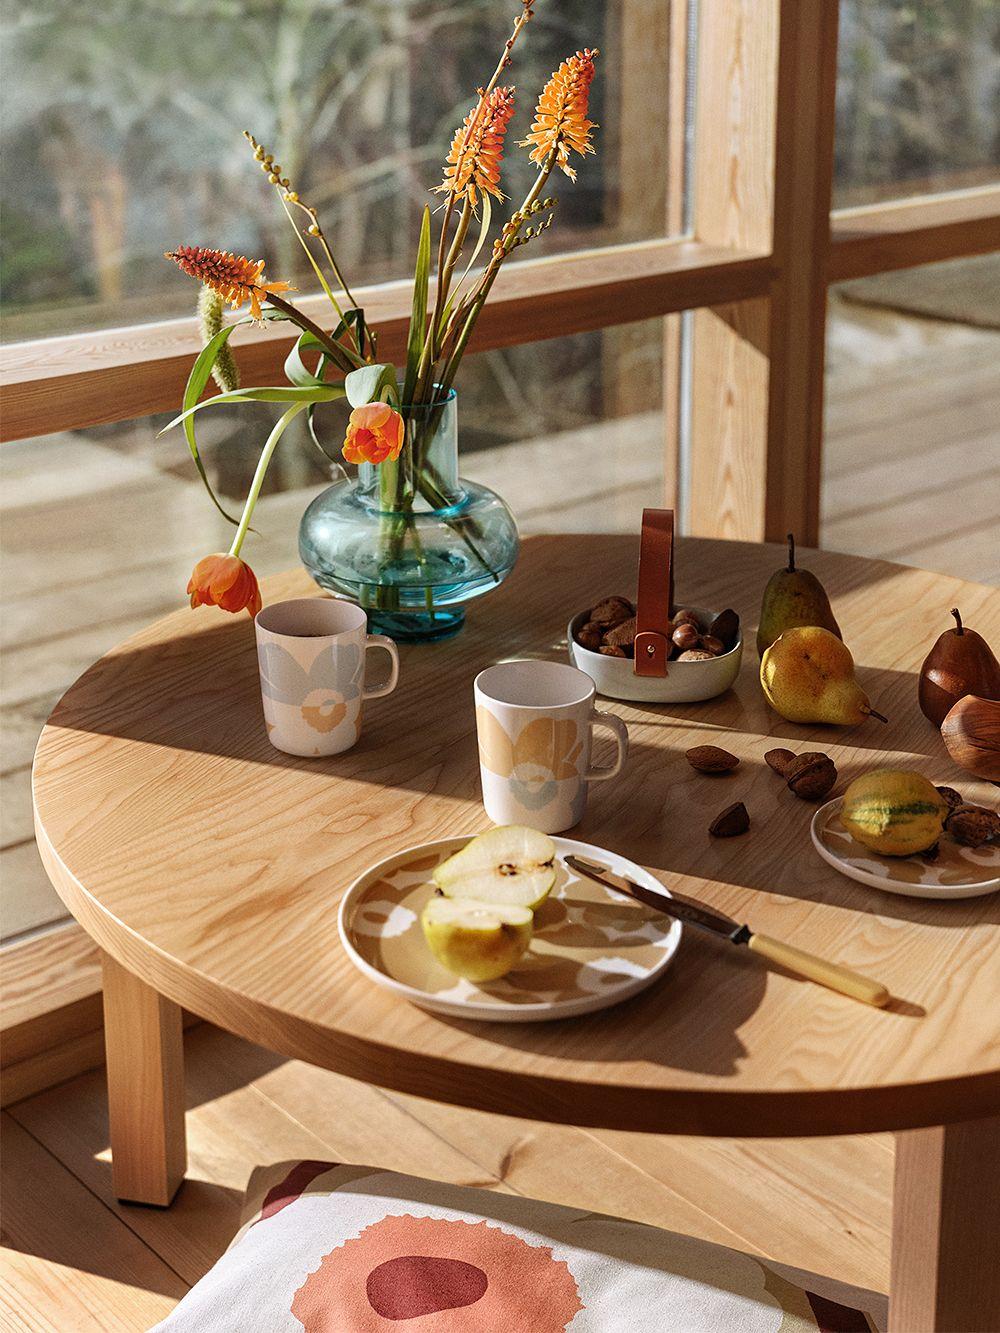 Marimekko Oiva - Unikko mug 2,5 dl, 2 pcs, white - beige - aqua